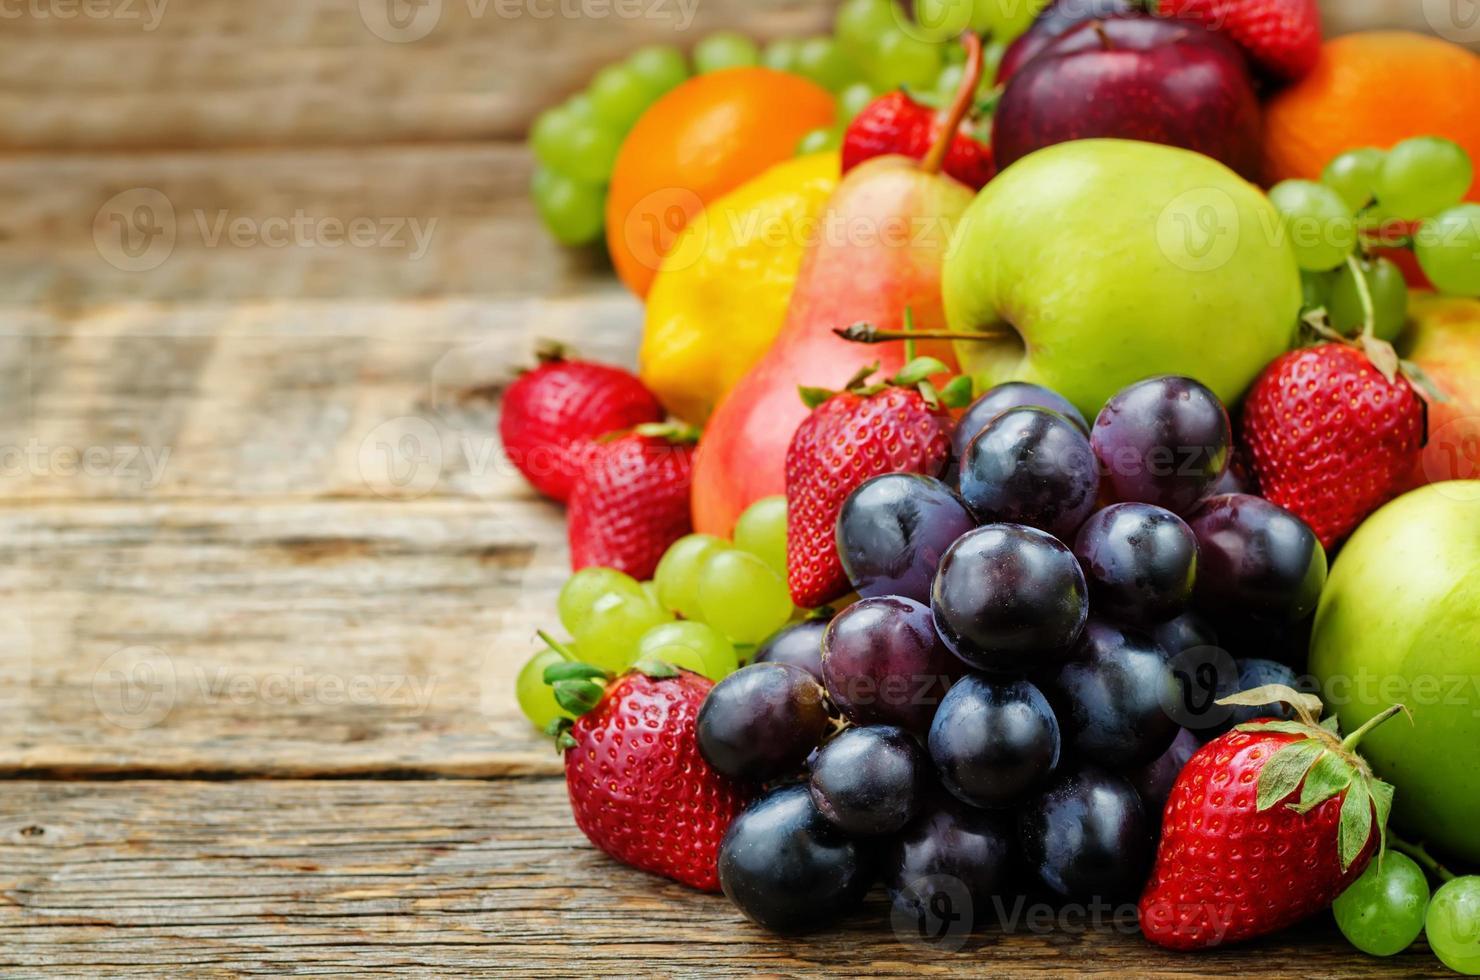 vruchten. mango, citroen, pruim, druif, peer, sinaasappel, appel, banaan, aardbei foto